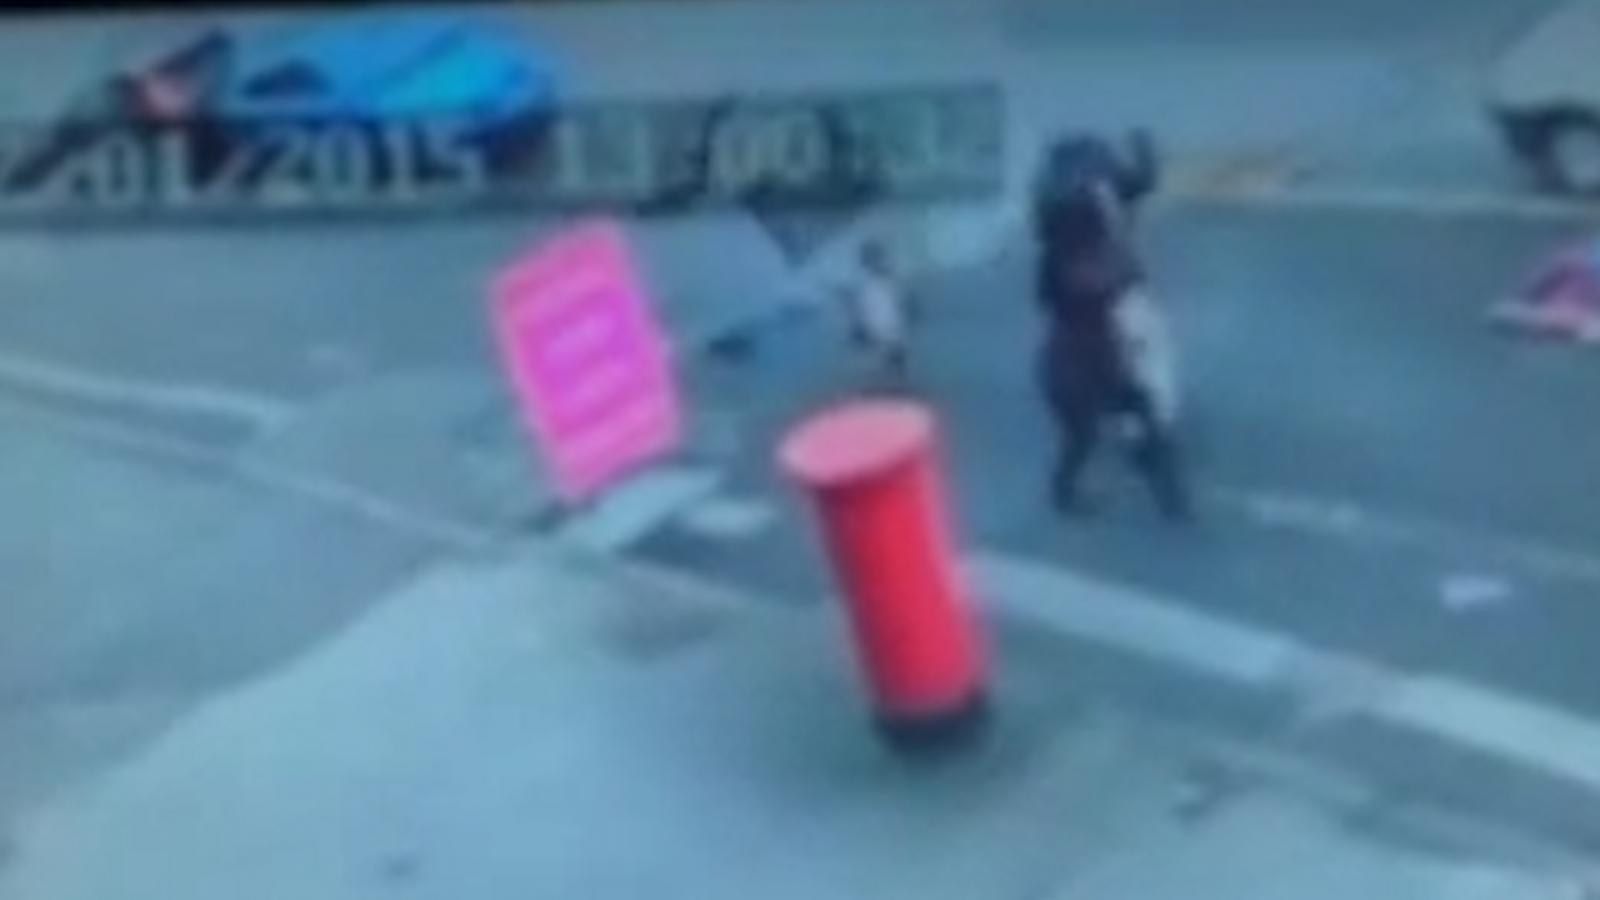 Exploding manhole cover narrowly misses child in Birmingham